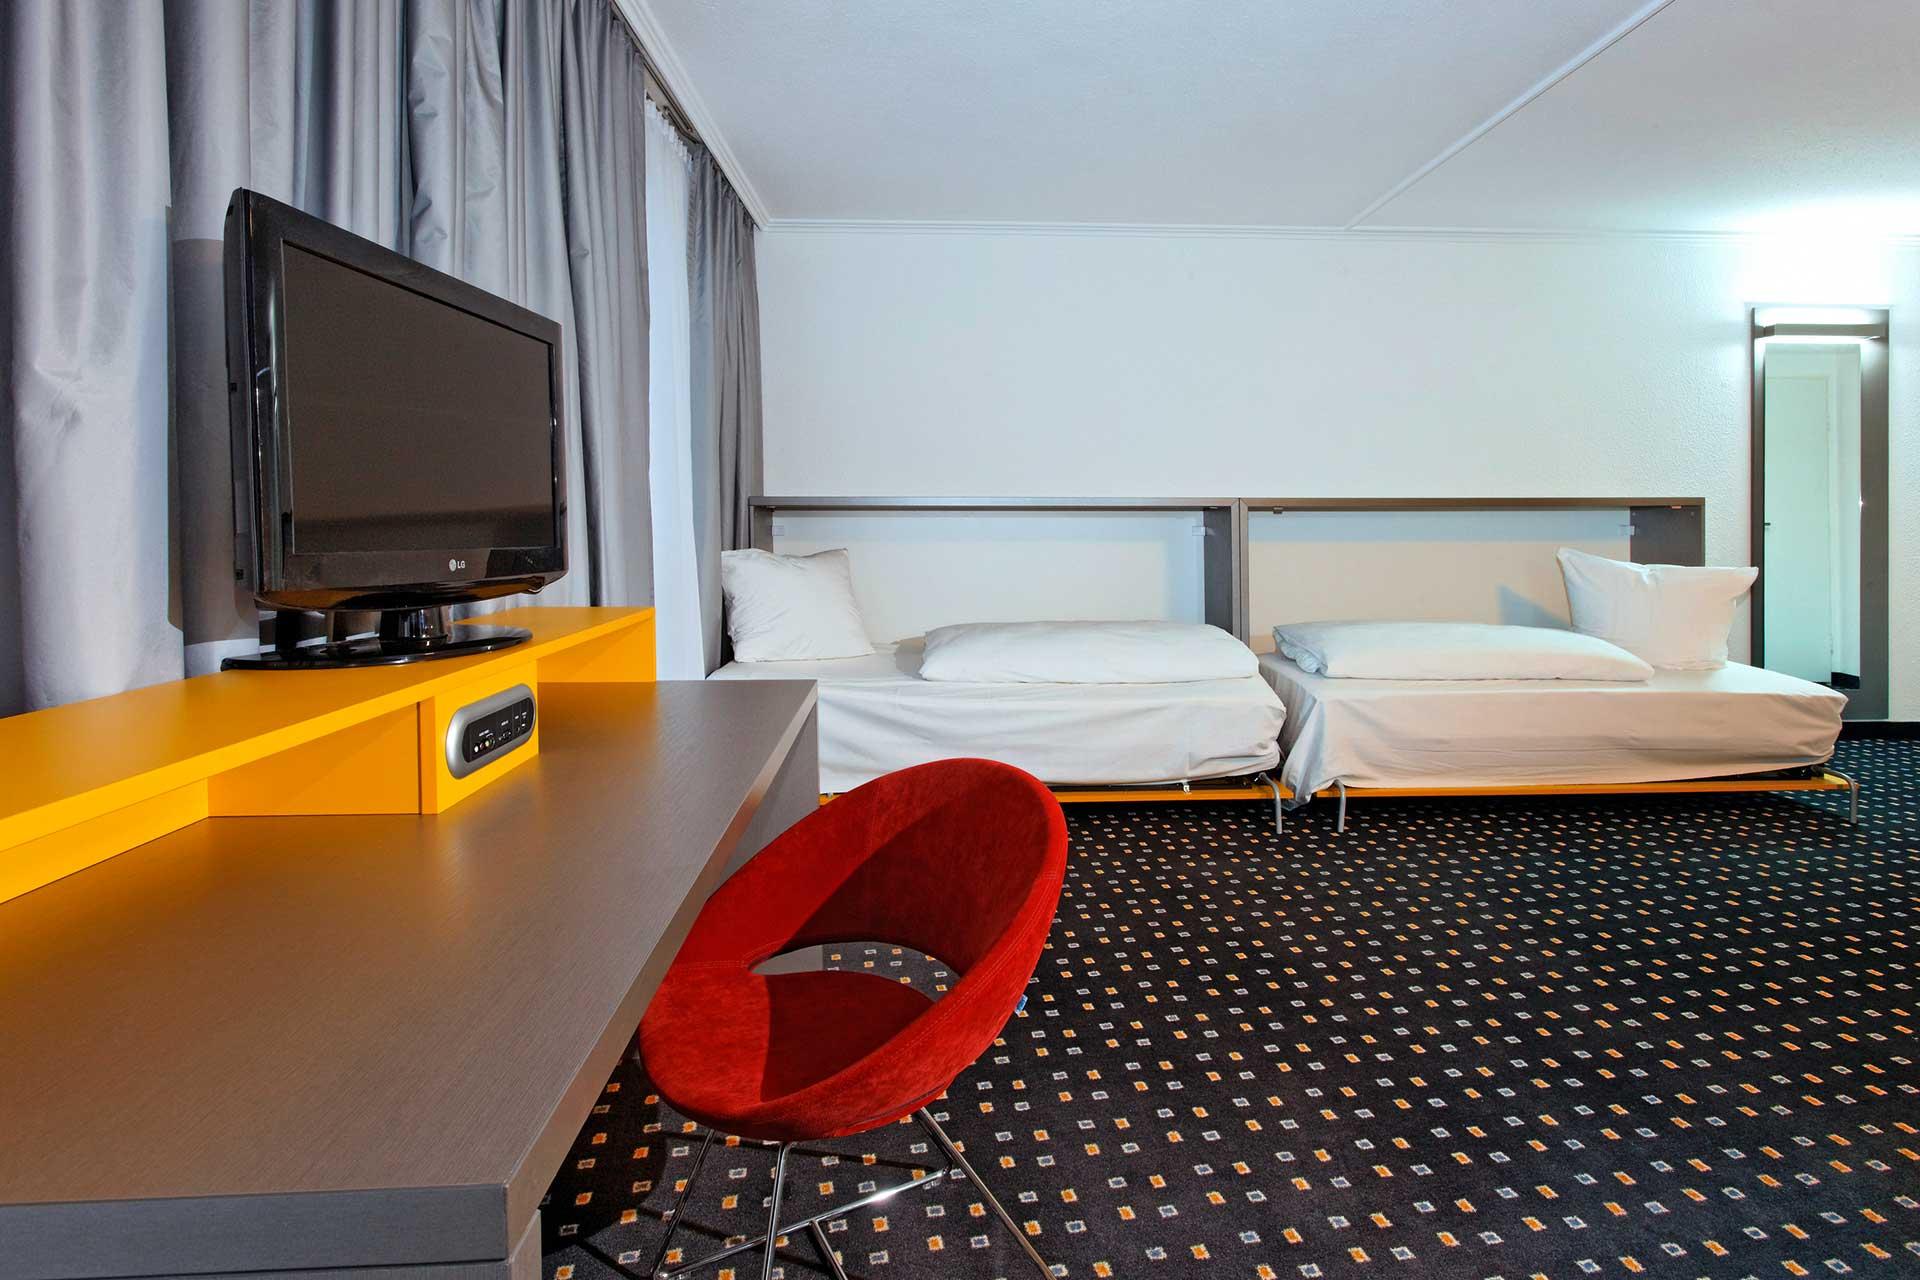 Ibis Hotel Frankfurt Airport Adresse